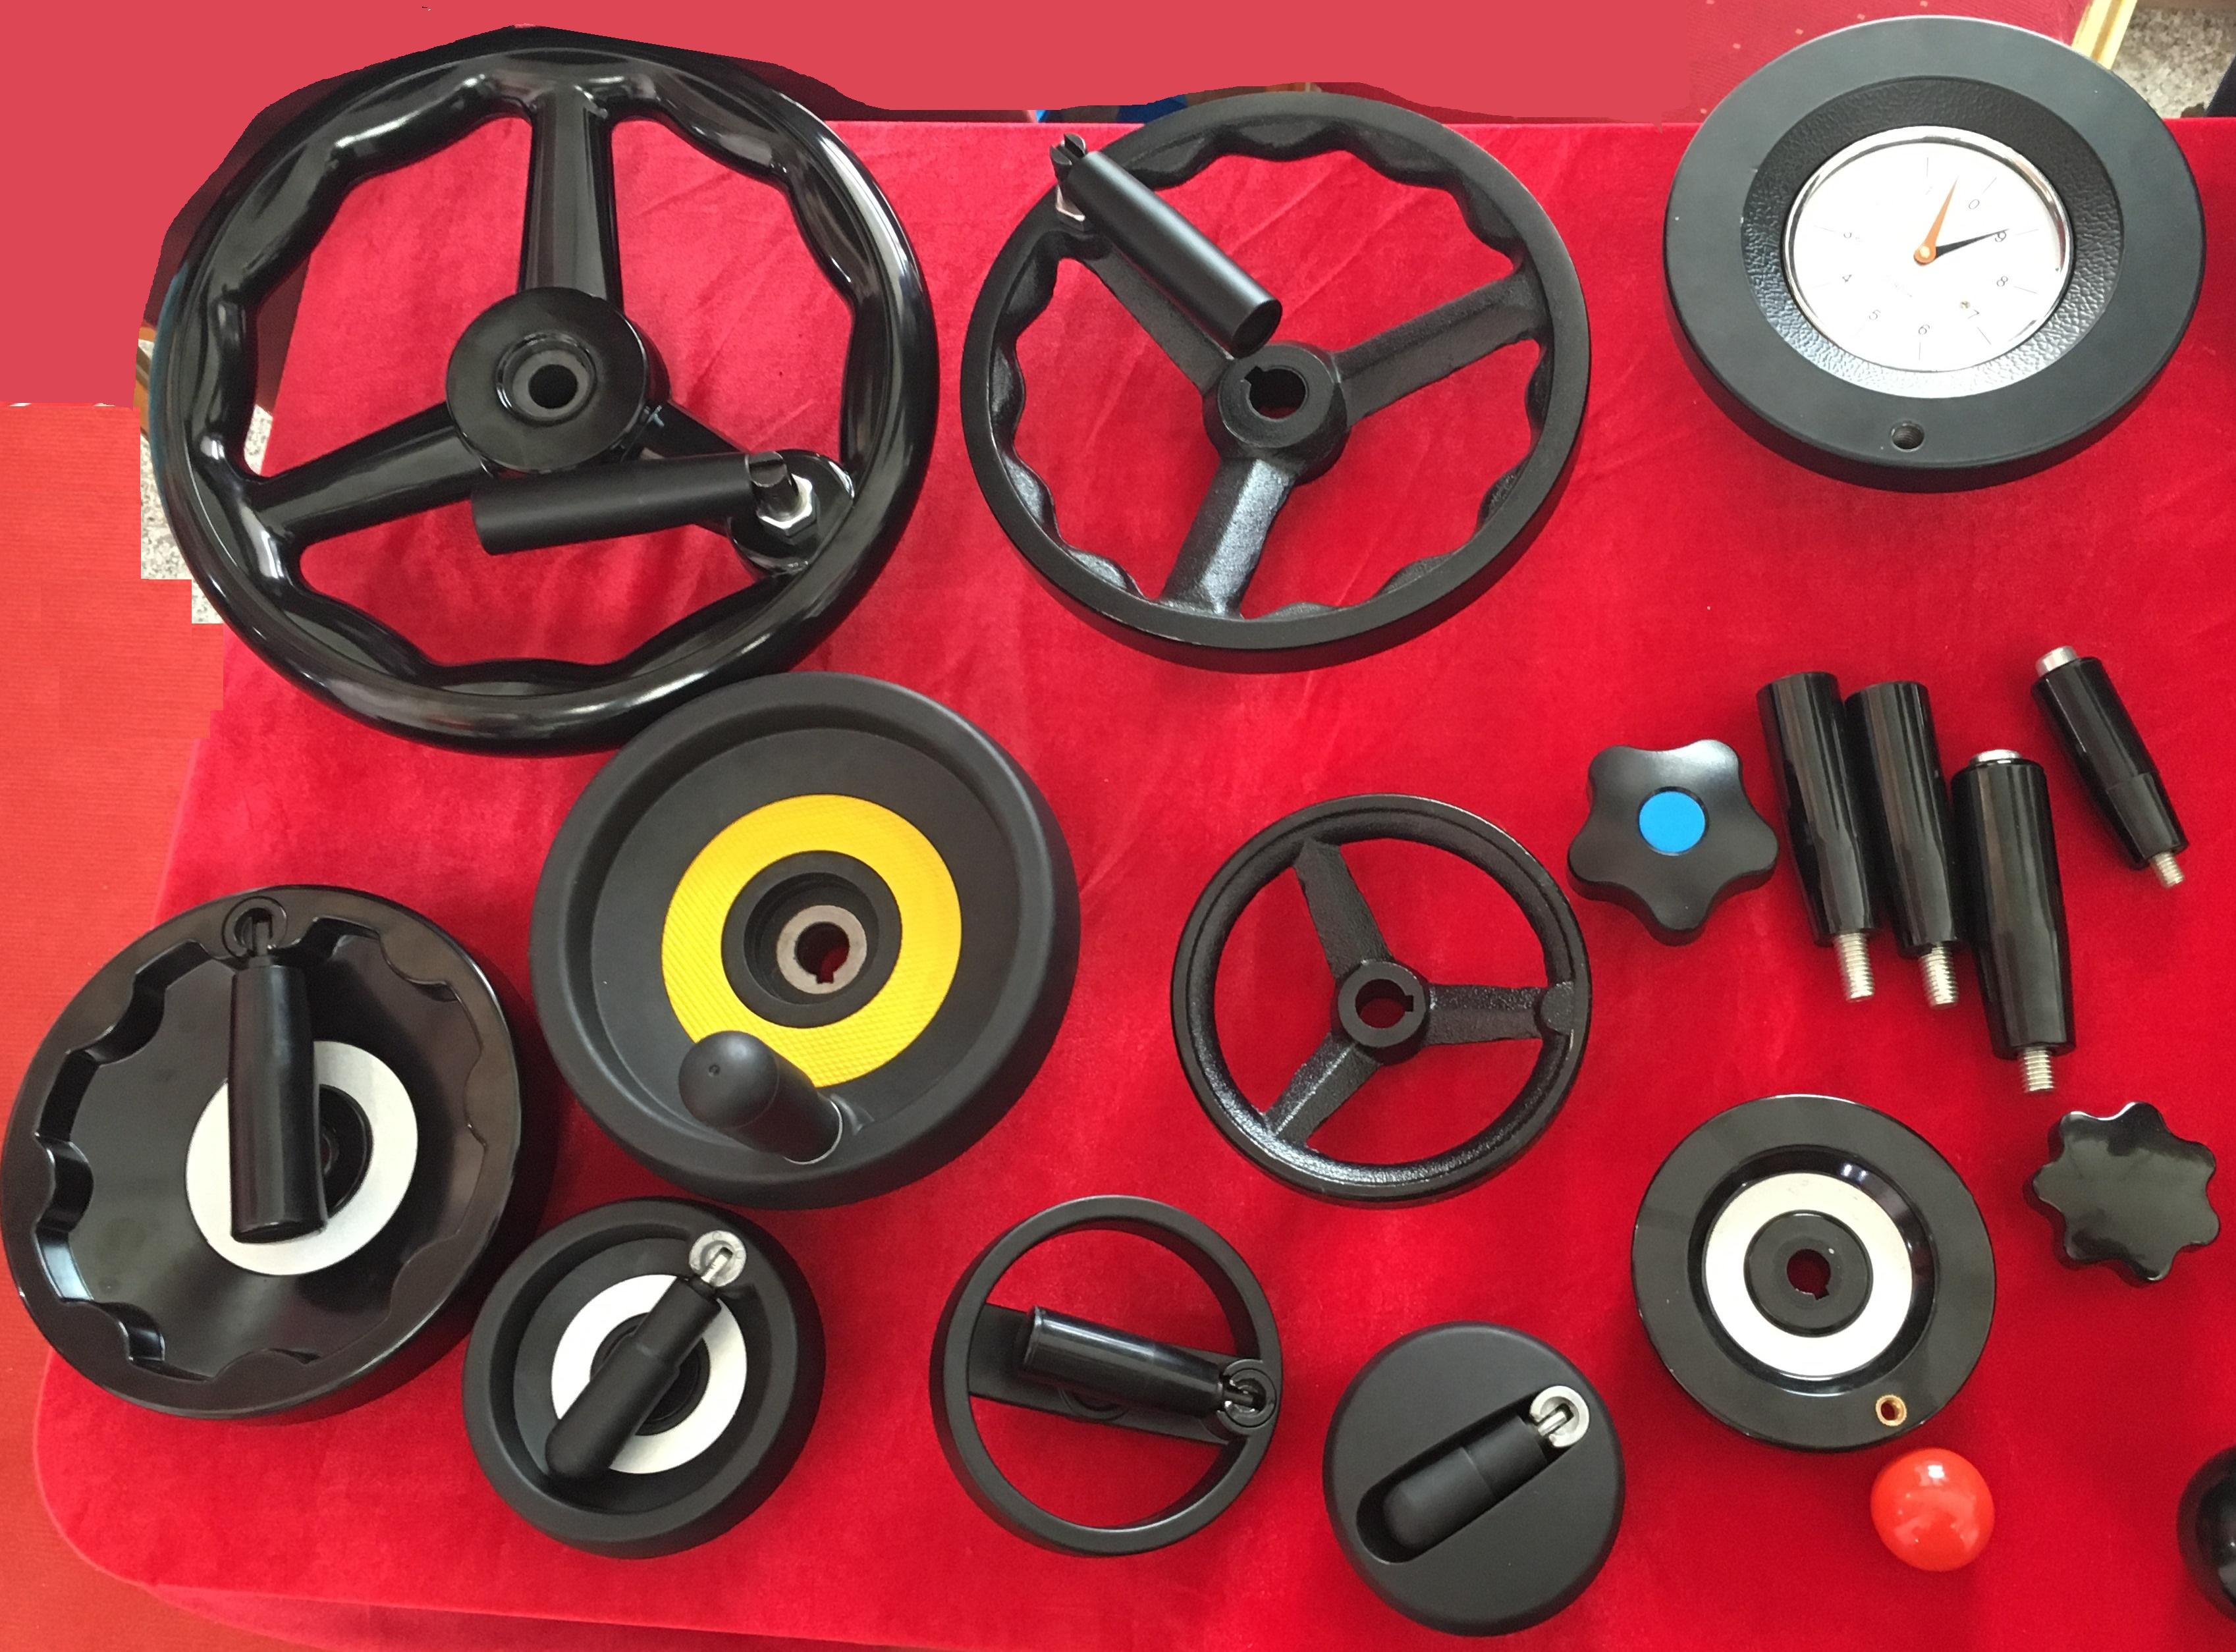 Bakelite handwheel